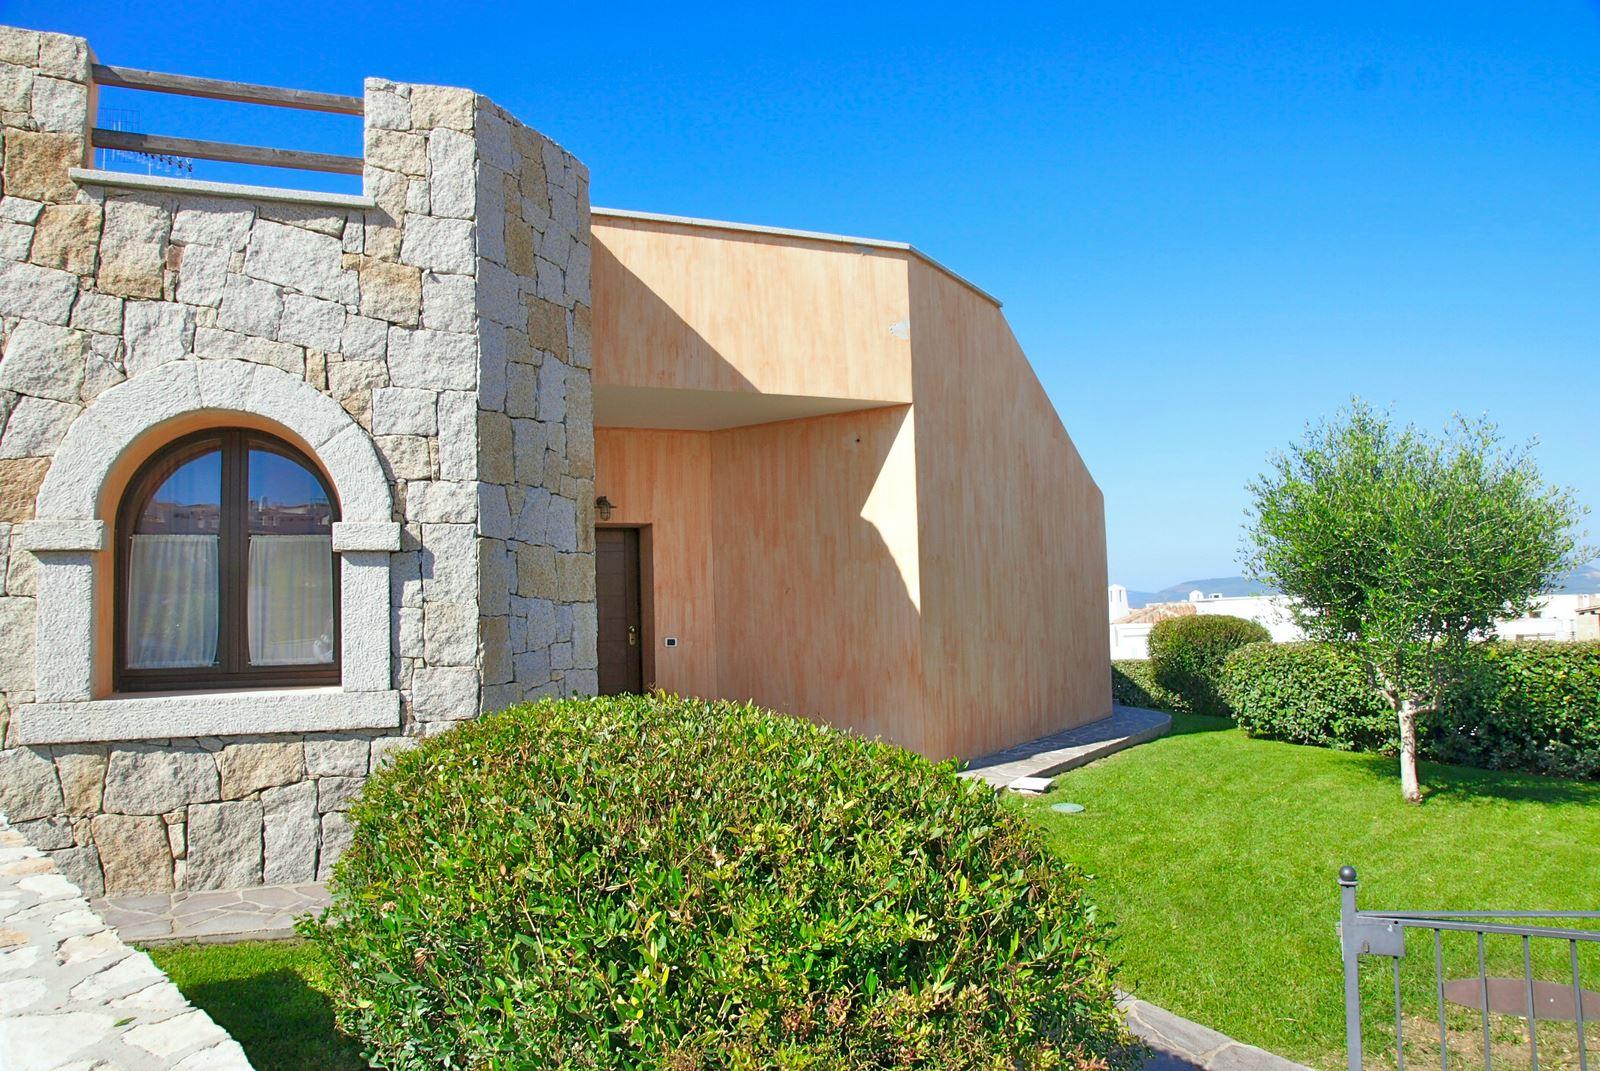 Ferienhaus Carru (877334), Sant Angelo Custode, Sassari, Sardinien, Italien, Bild 10